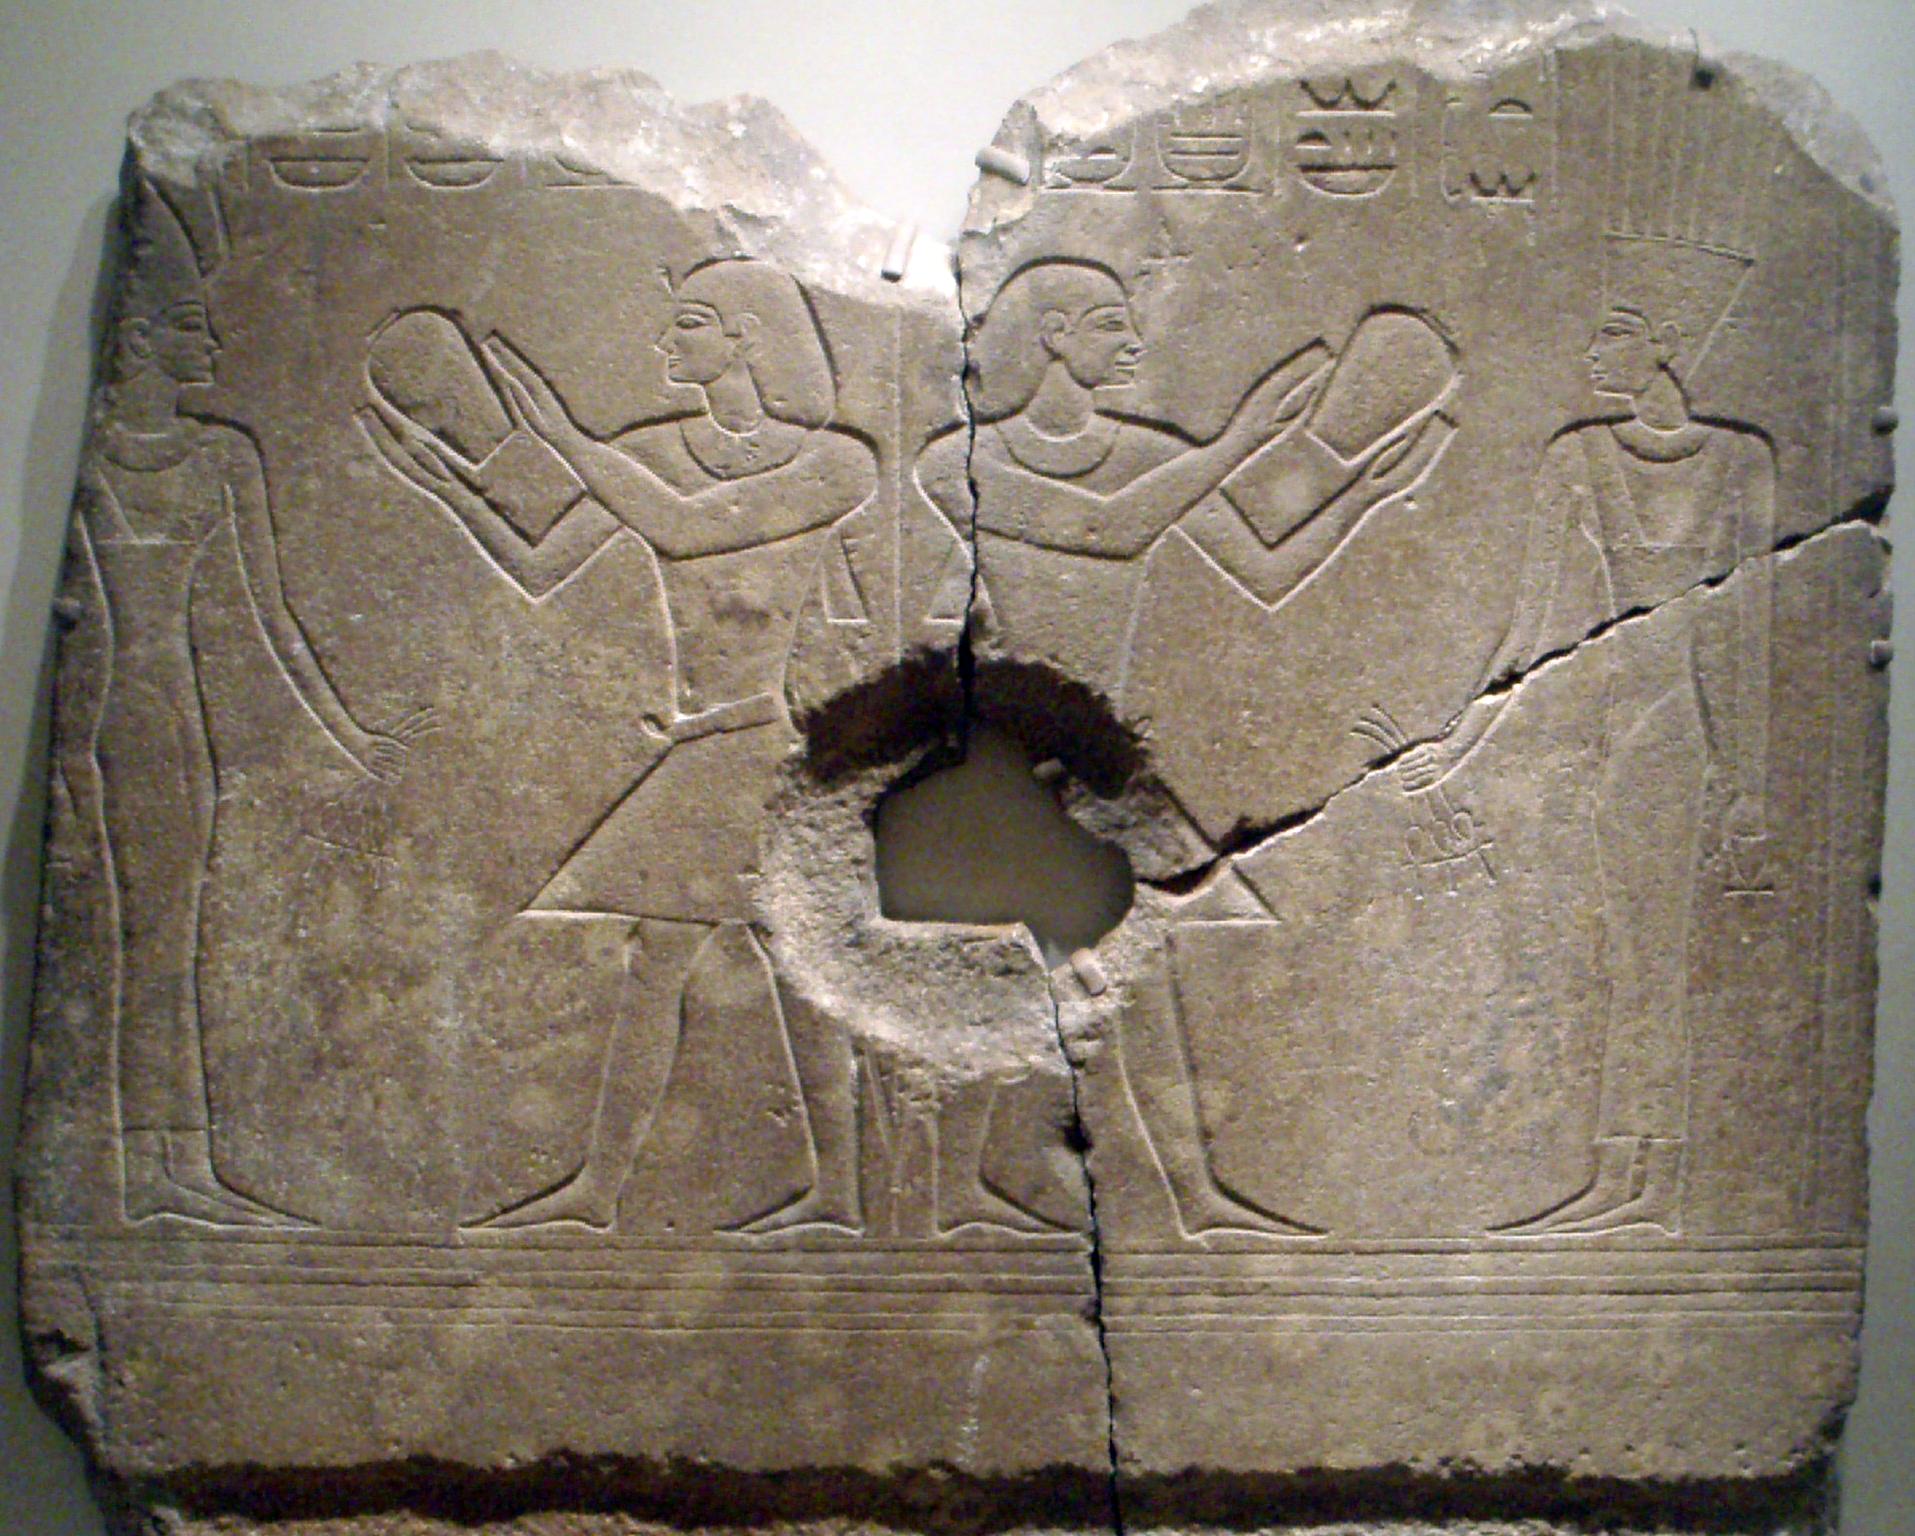 sobekhotepiii-dualrelief brooklynmuseum.png